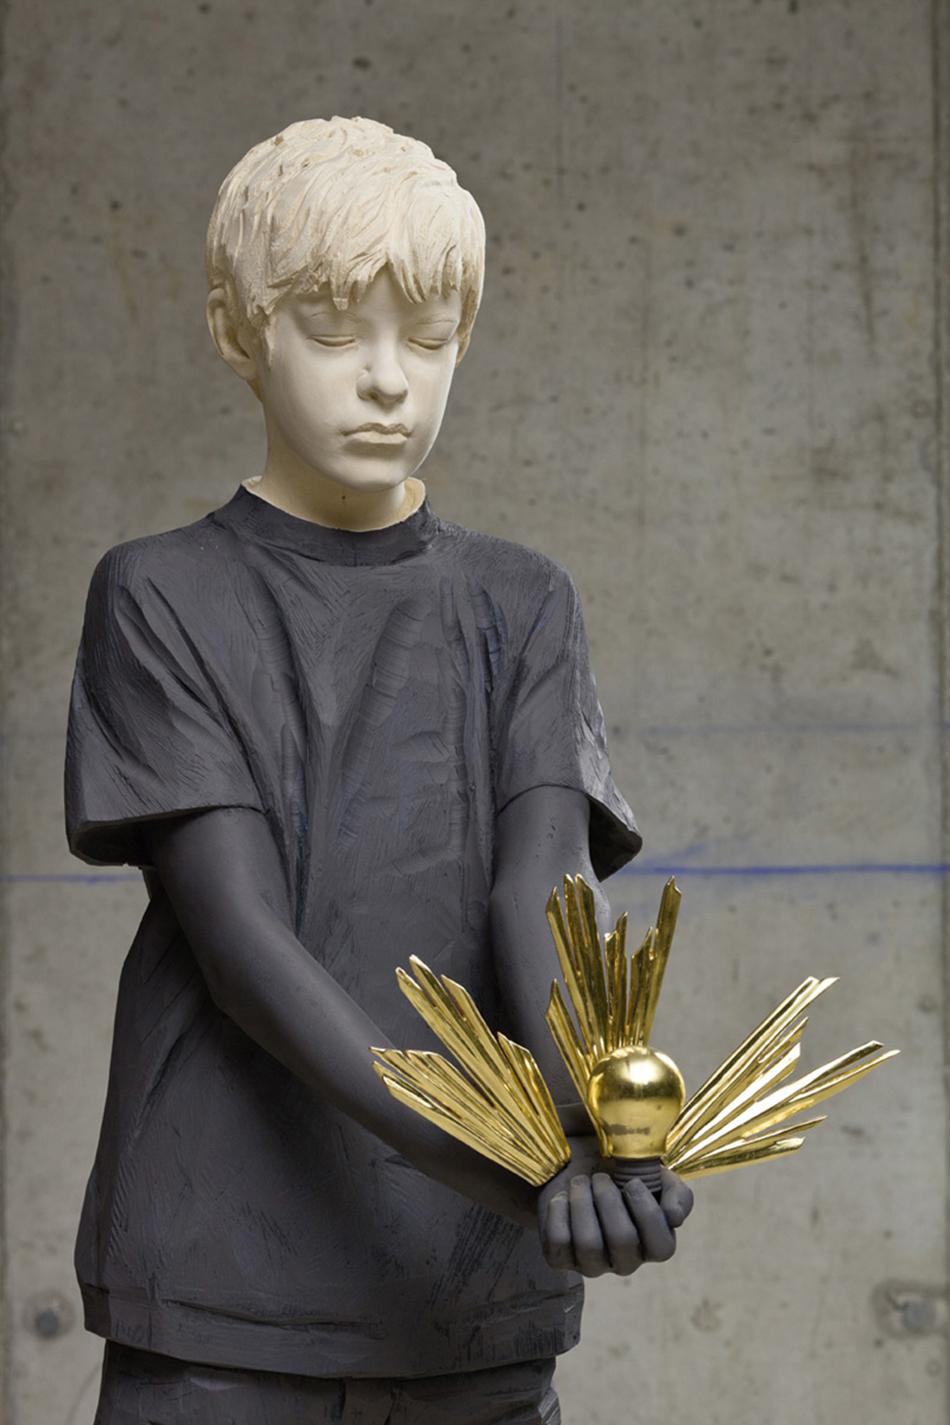 Willy Verginer Amazing Figurative Wood Sculptures  Willy Verginer Amazing Figurative Wood Sculptures 3